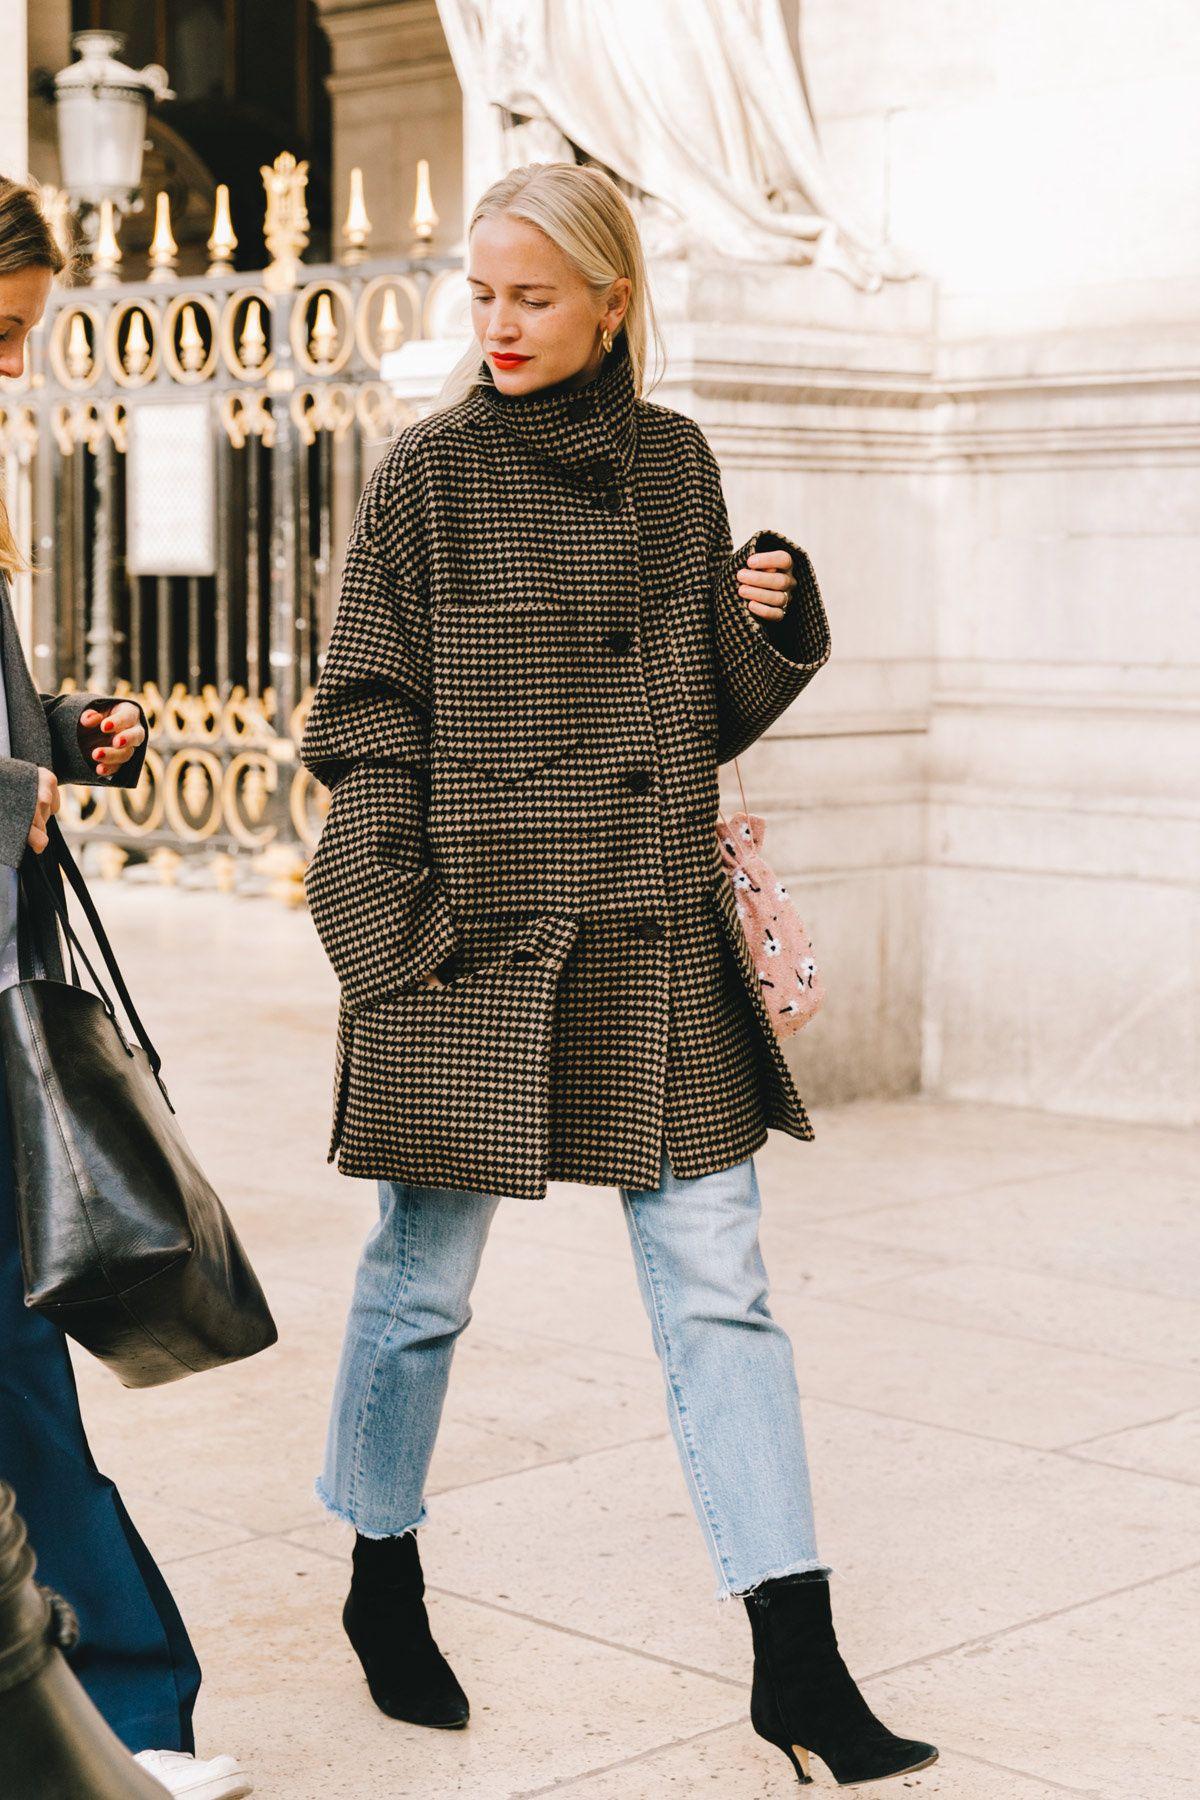 Pin Von Silvia Kaerle Auf Streetstyle In 2018 Pinterest Style Meitaviamp039s Kulot Denim Midi Culottes Fashion Und Street